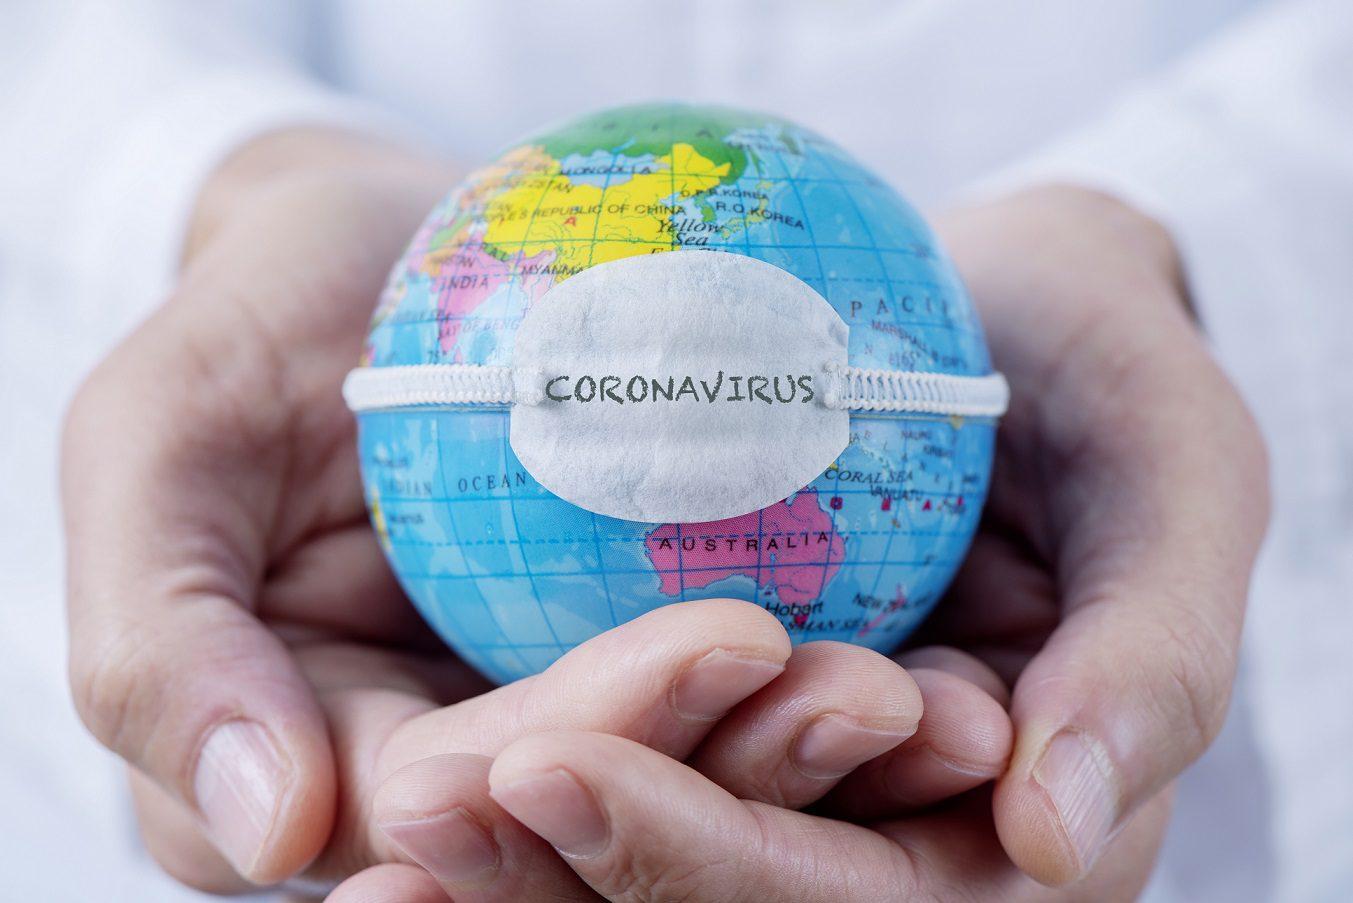 A pandemia de coronavírus e os cuidados realmente necessários